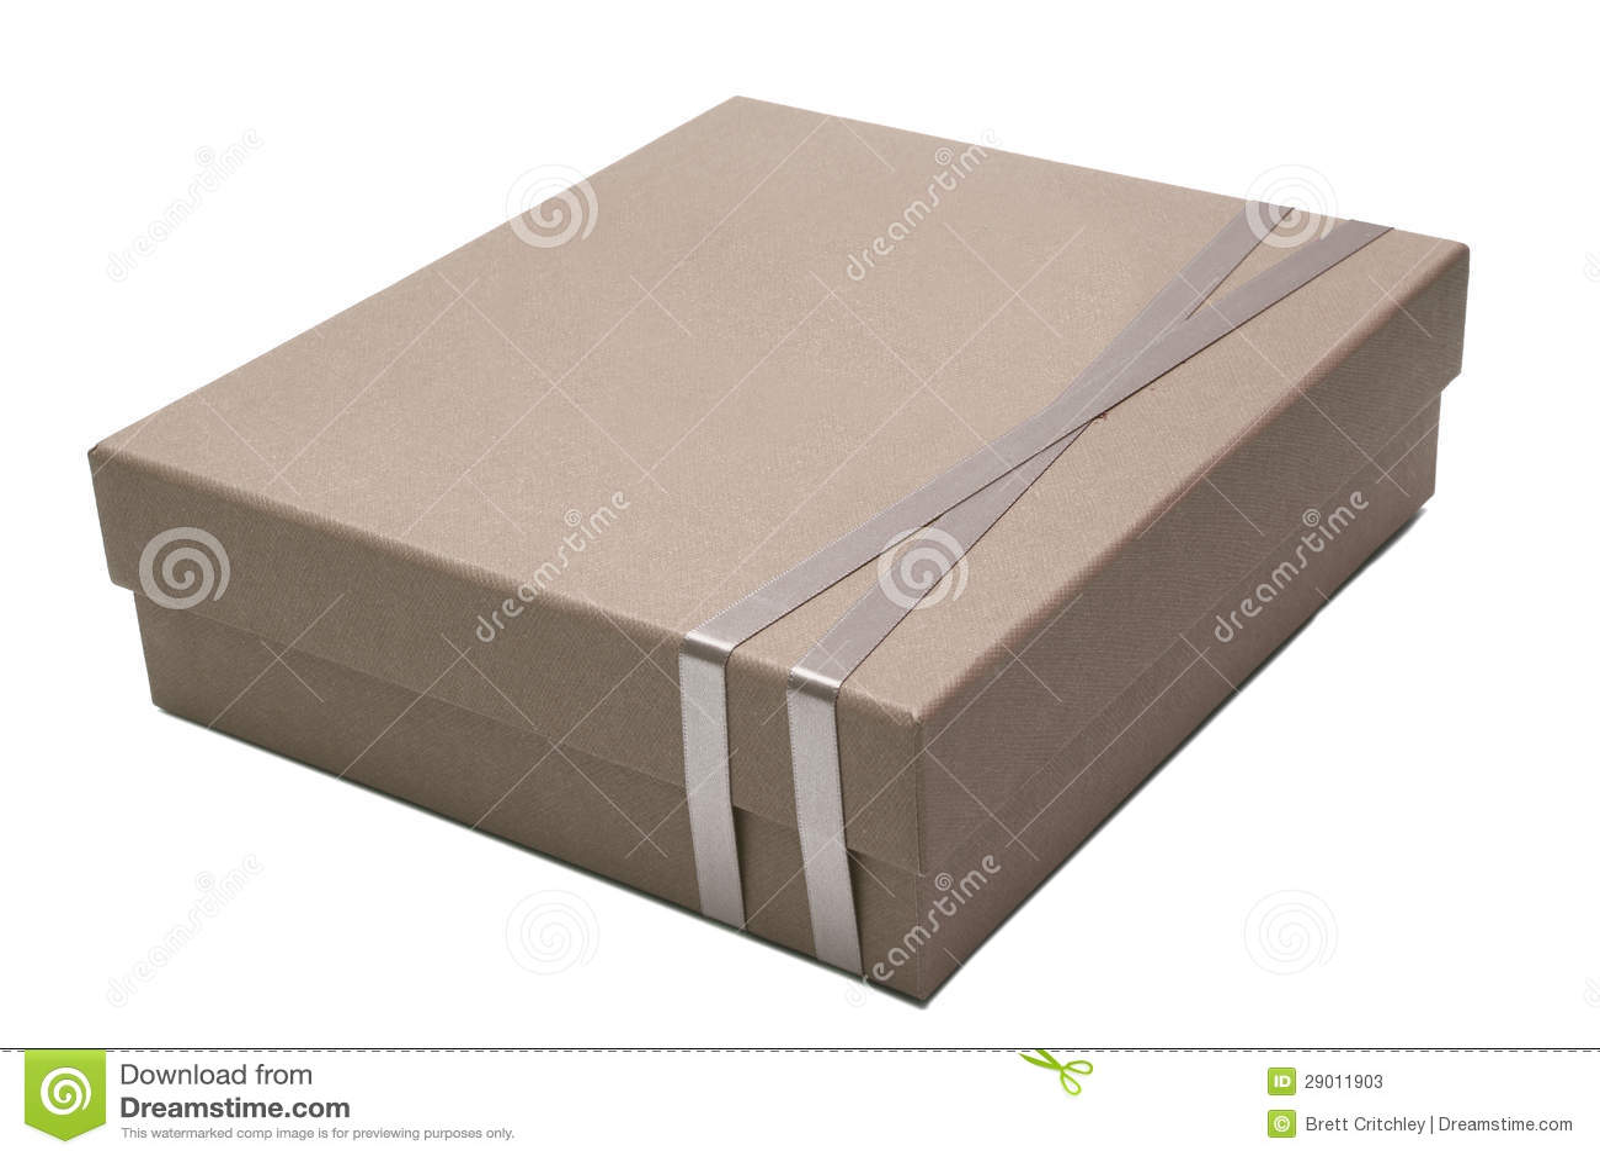 Cardboard Box Parcel Stock Photos - Image: 29011903